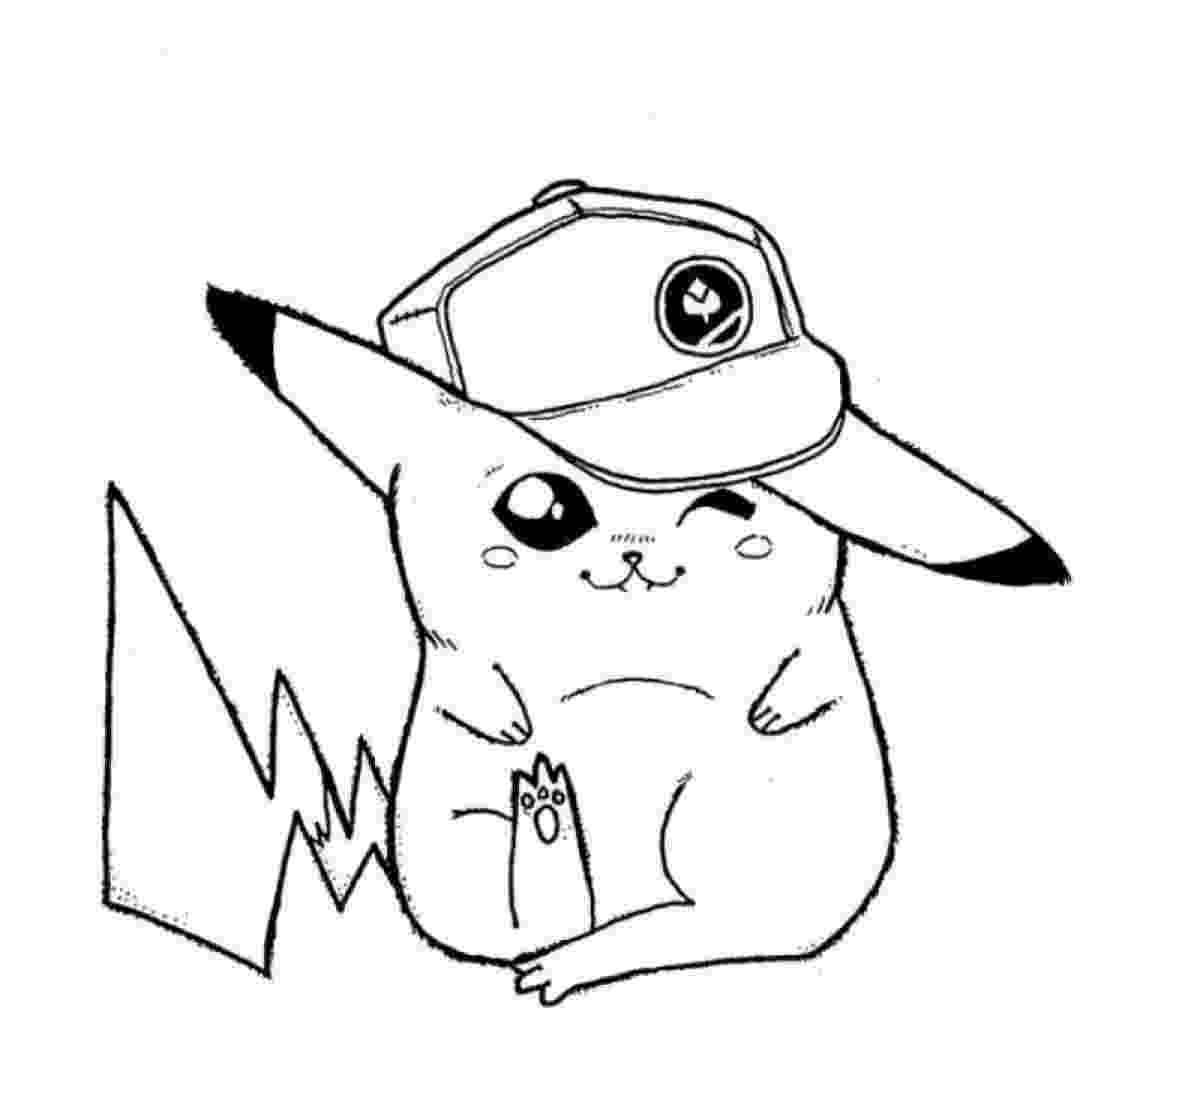 cute pikachu coloring pages cute pikachu coloring pages at getcoloringscom free pikachu pages cute coloring